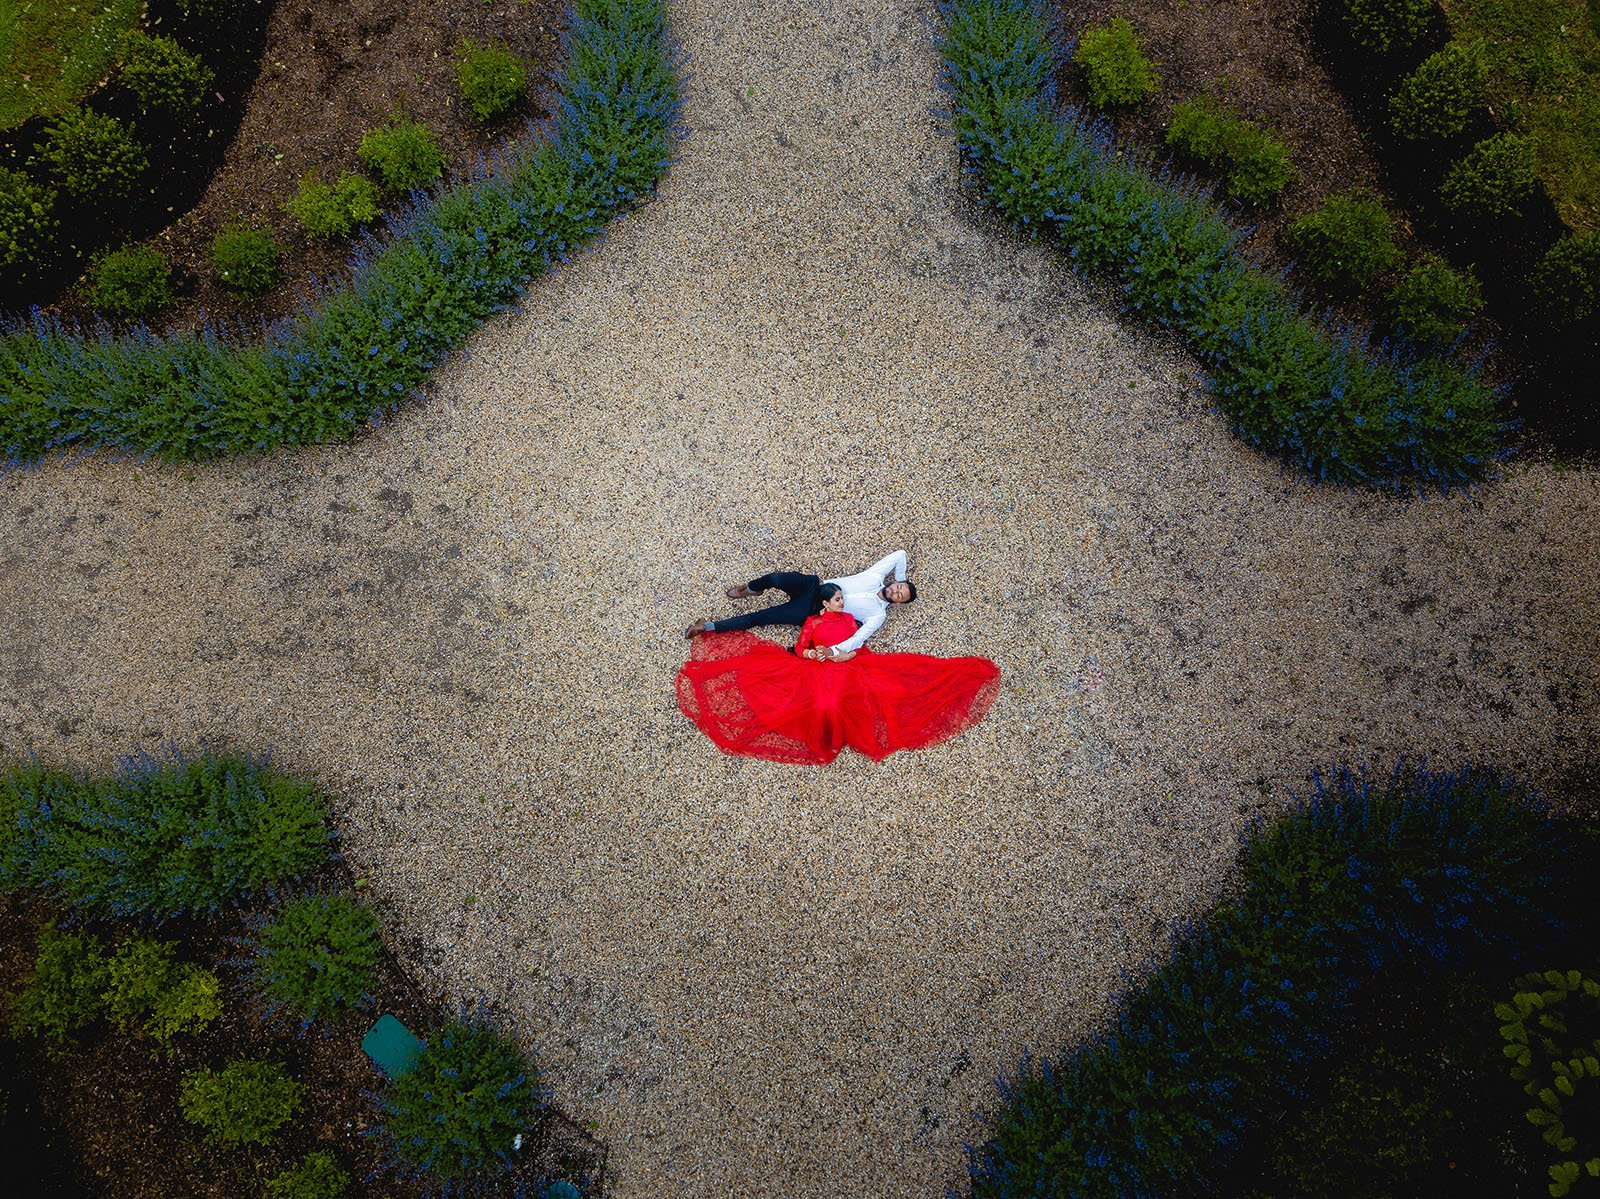 Planting-Fields-Arboretum-Engagement-Photos Engagement